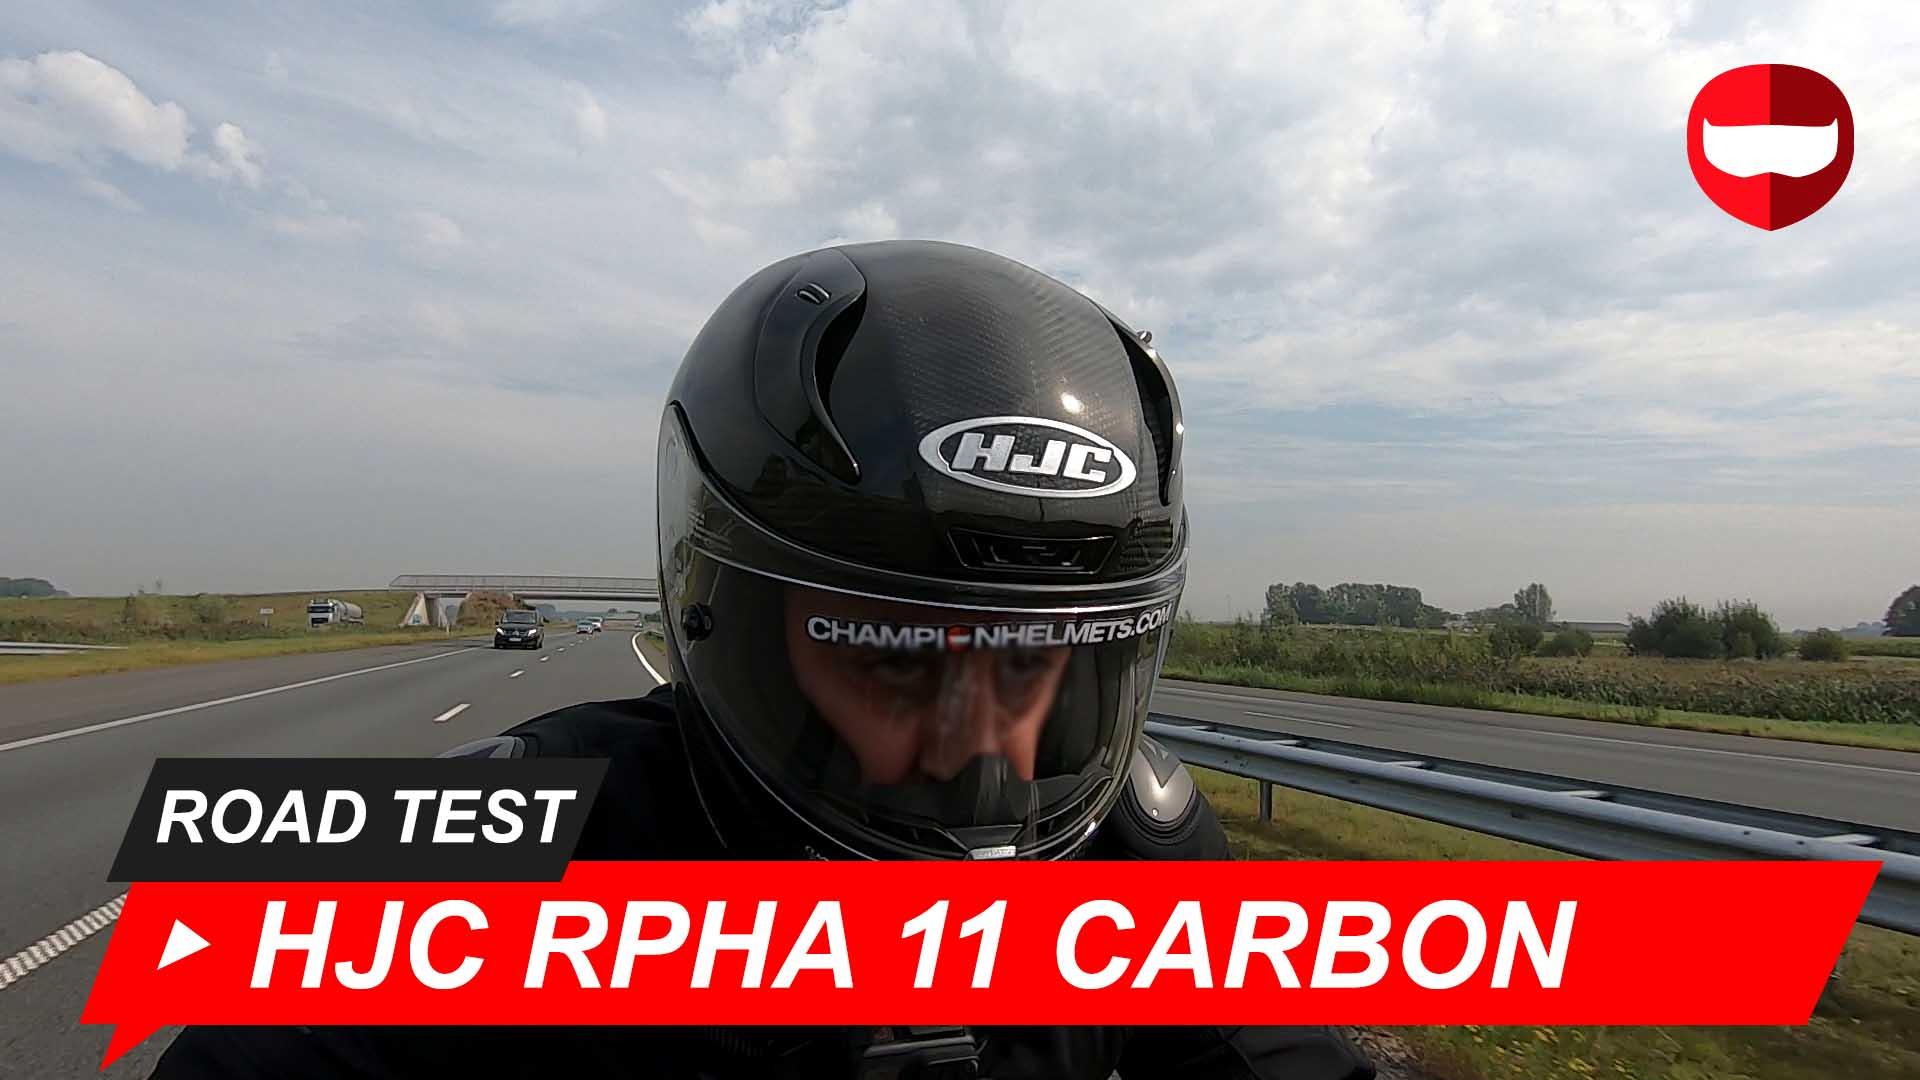 HJC RPHA 11 Carbon Road Test + Video